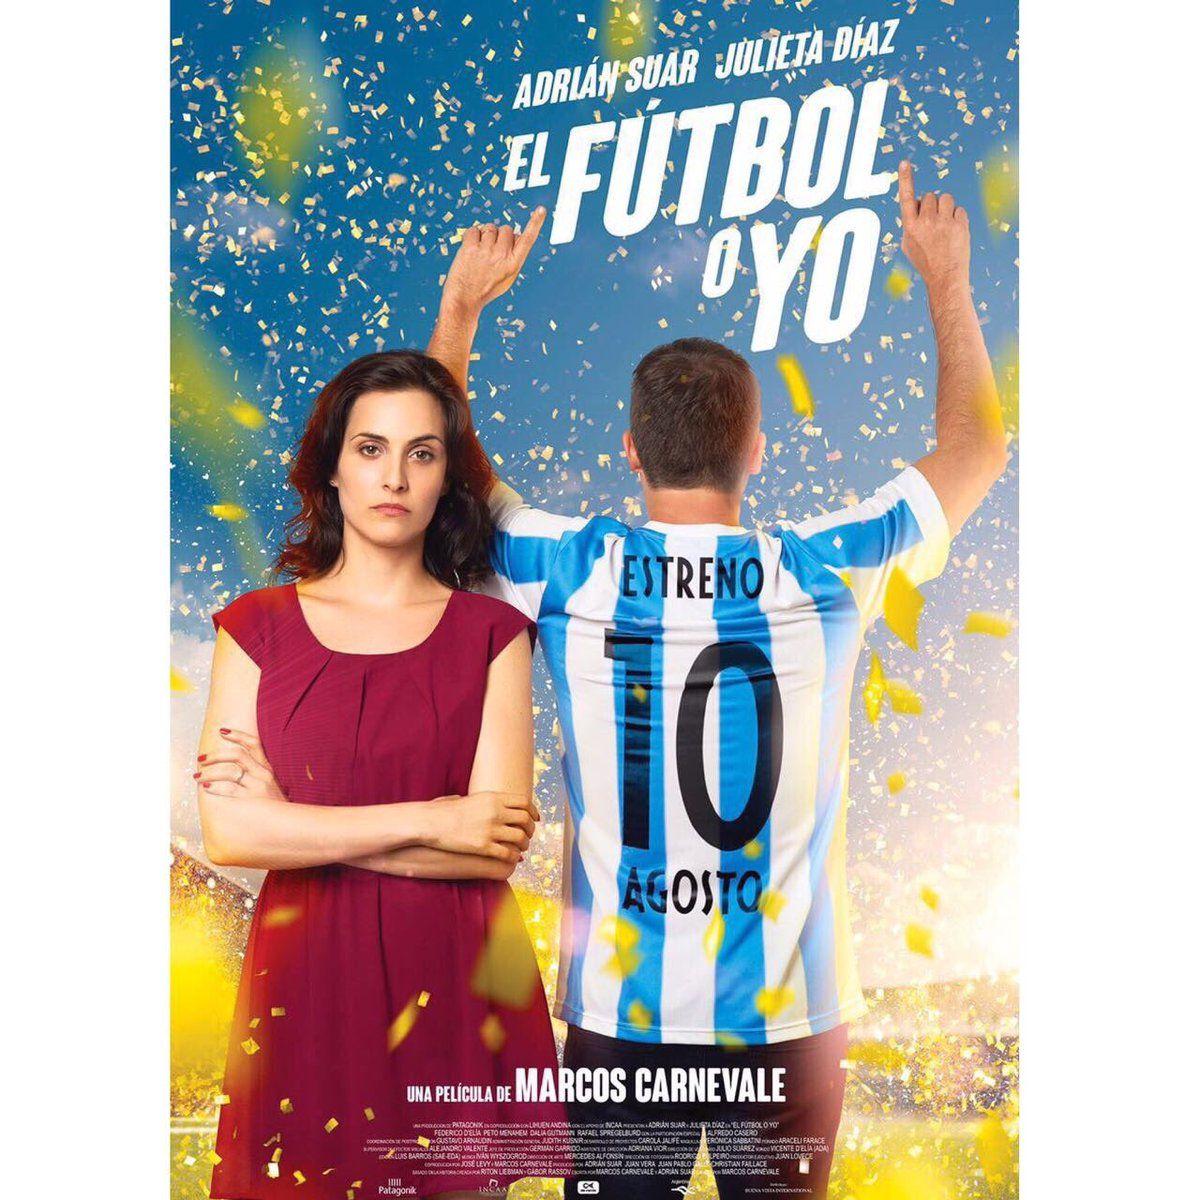 Tele comedias argentinas online dating